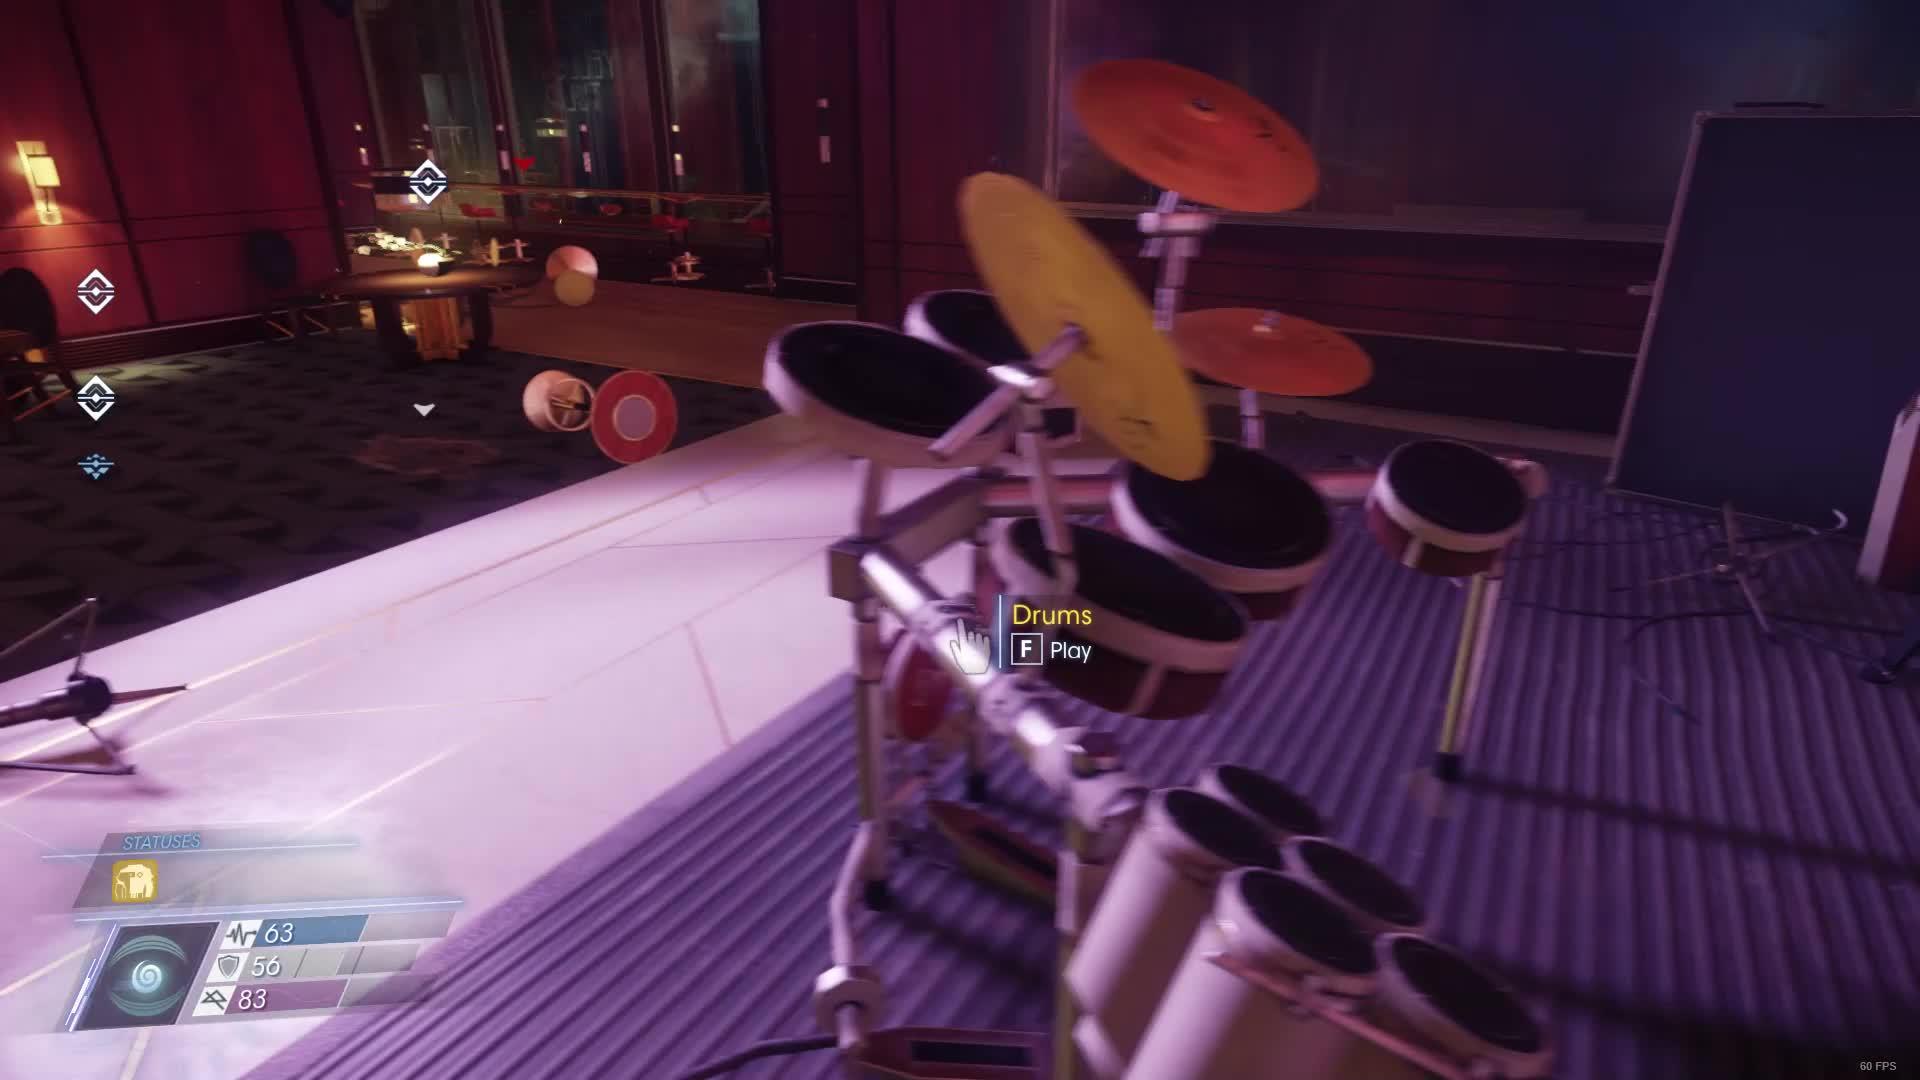 Prey - Drums GIFs